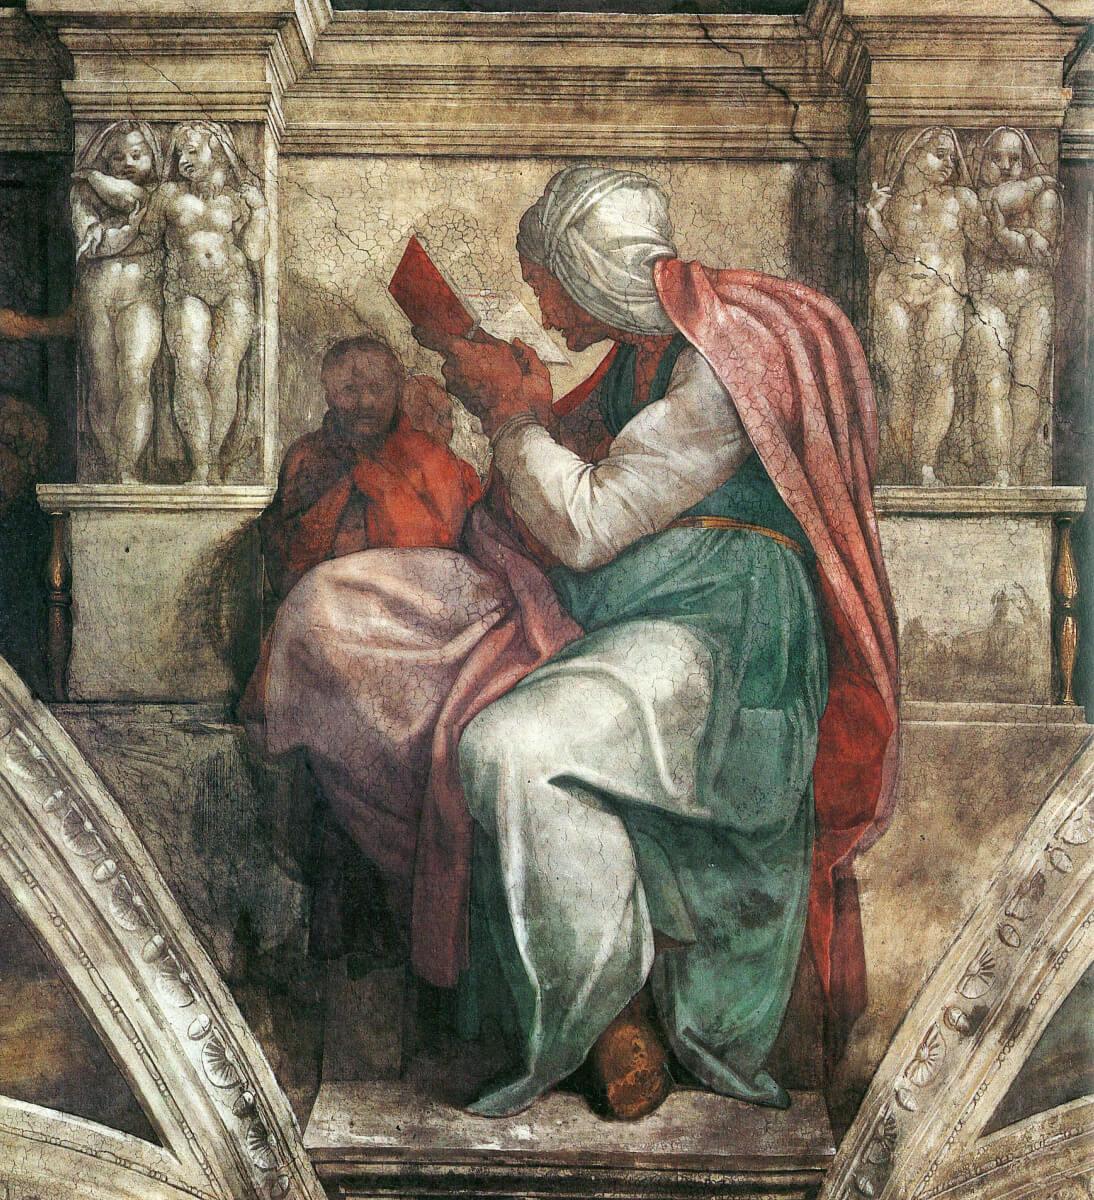 Микеланджело Буонарроти, 1508–1512 год, картина «Персидская сивилла».